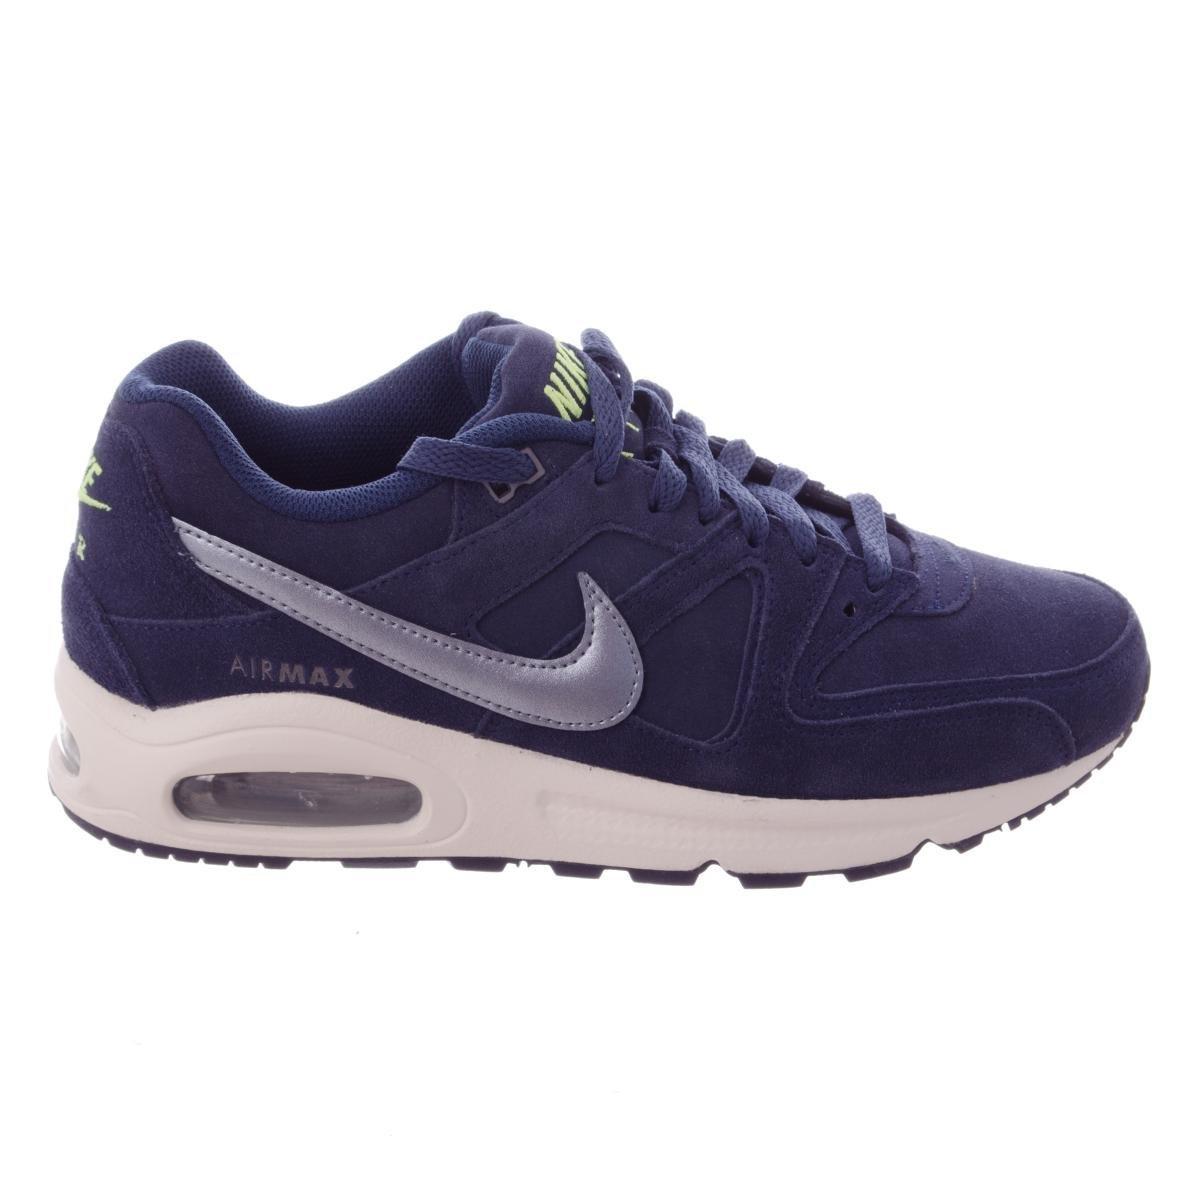 brand new cadb9 b8acf Nike WMNS Air Max Command PRM, Womens Sneakers